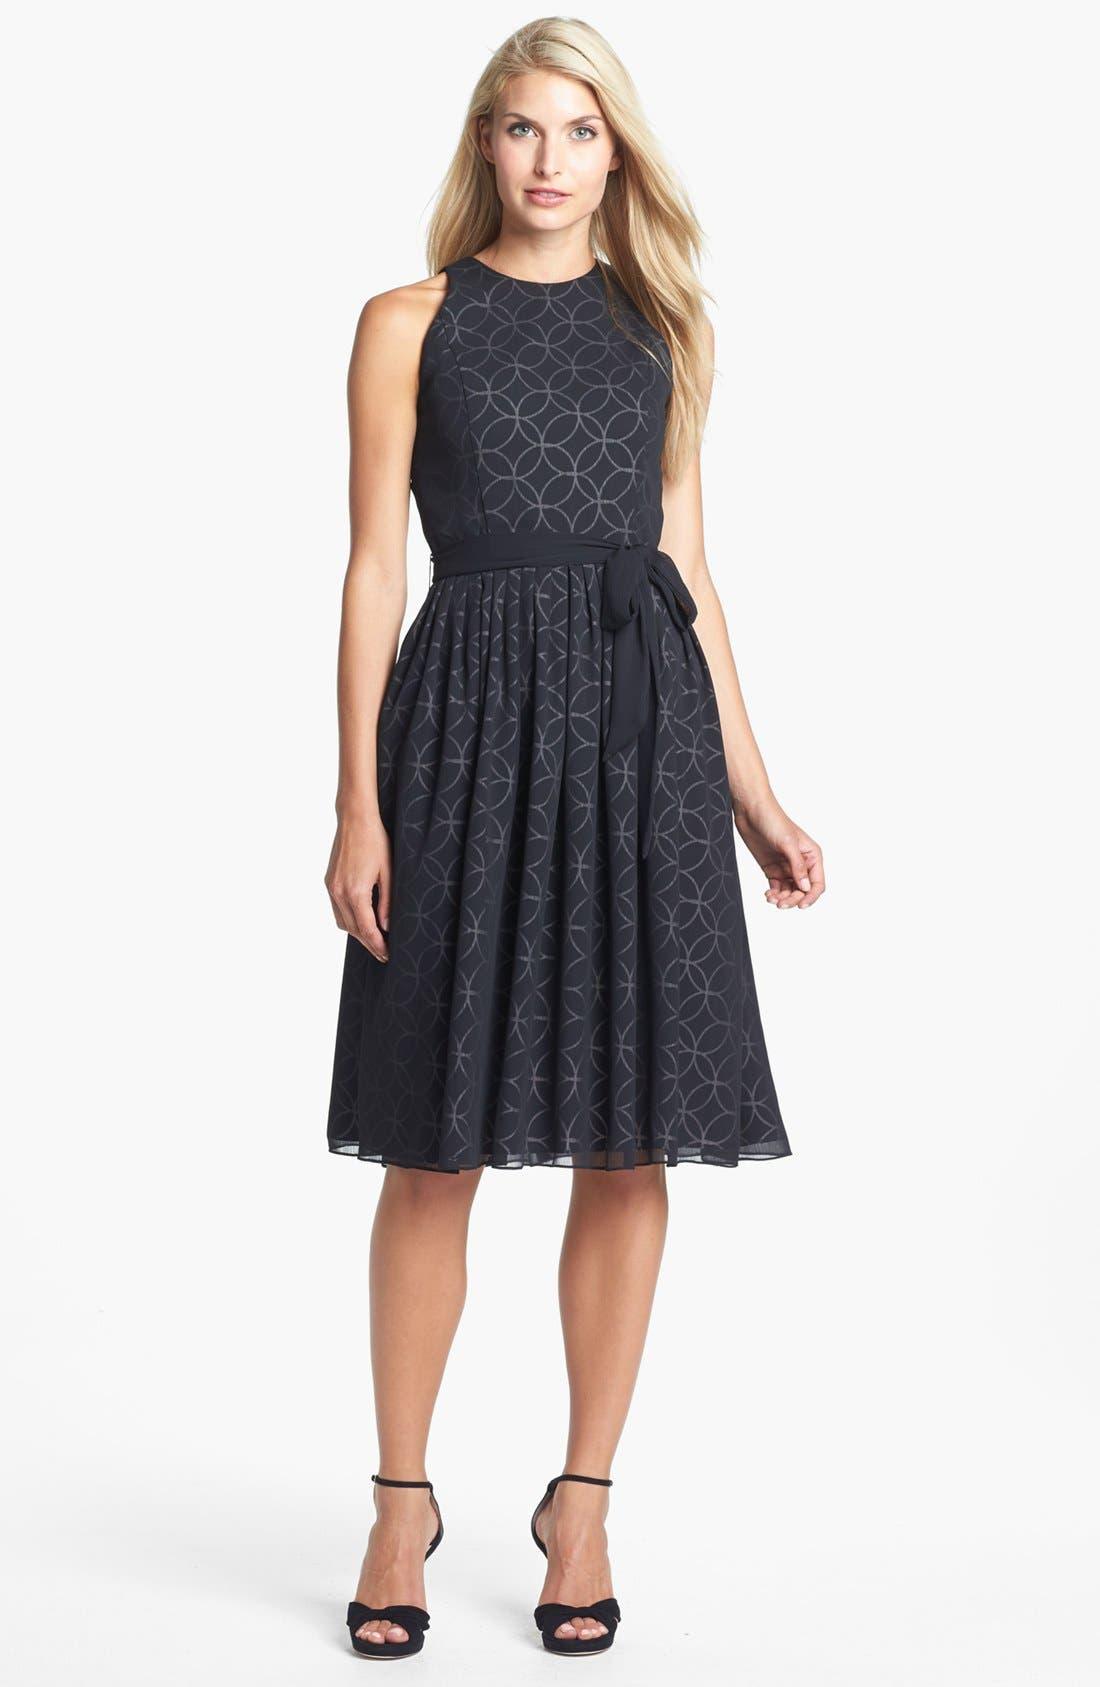 Alternate Image 1 Selected - Isaac Mizrahi New York Print Chiffon Fit & Flare Dress